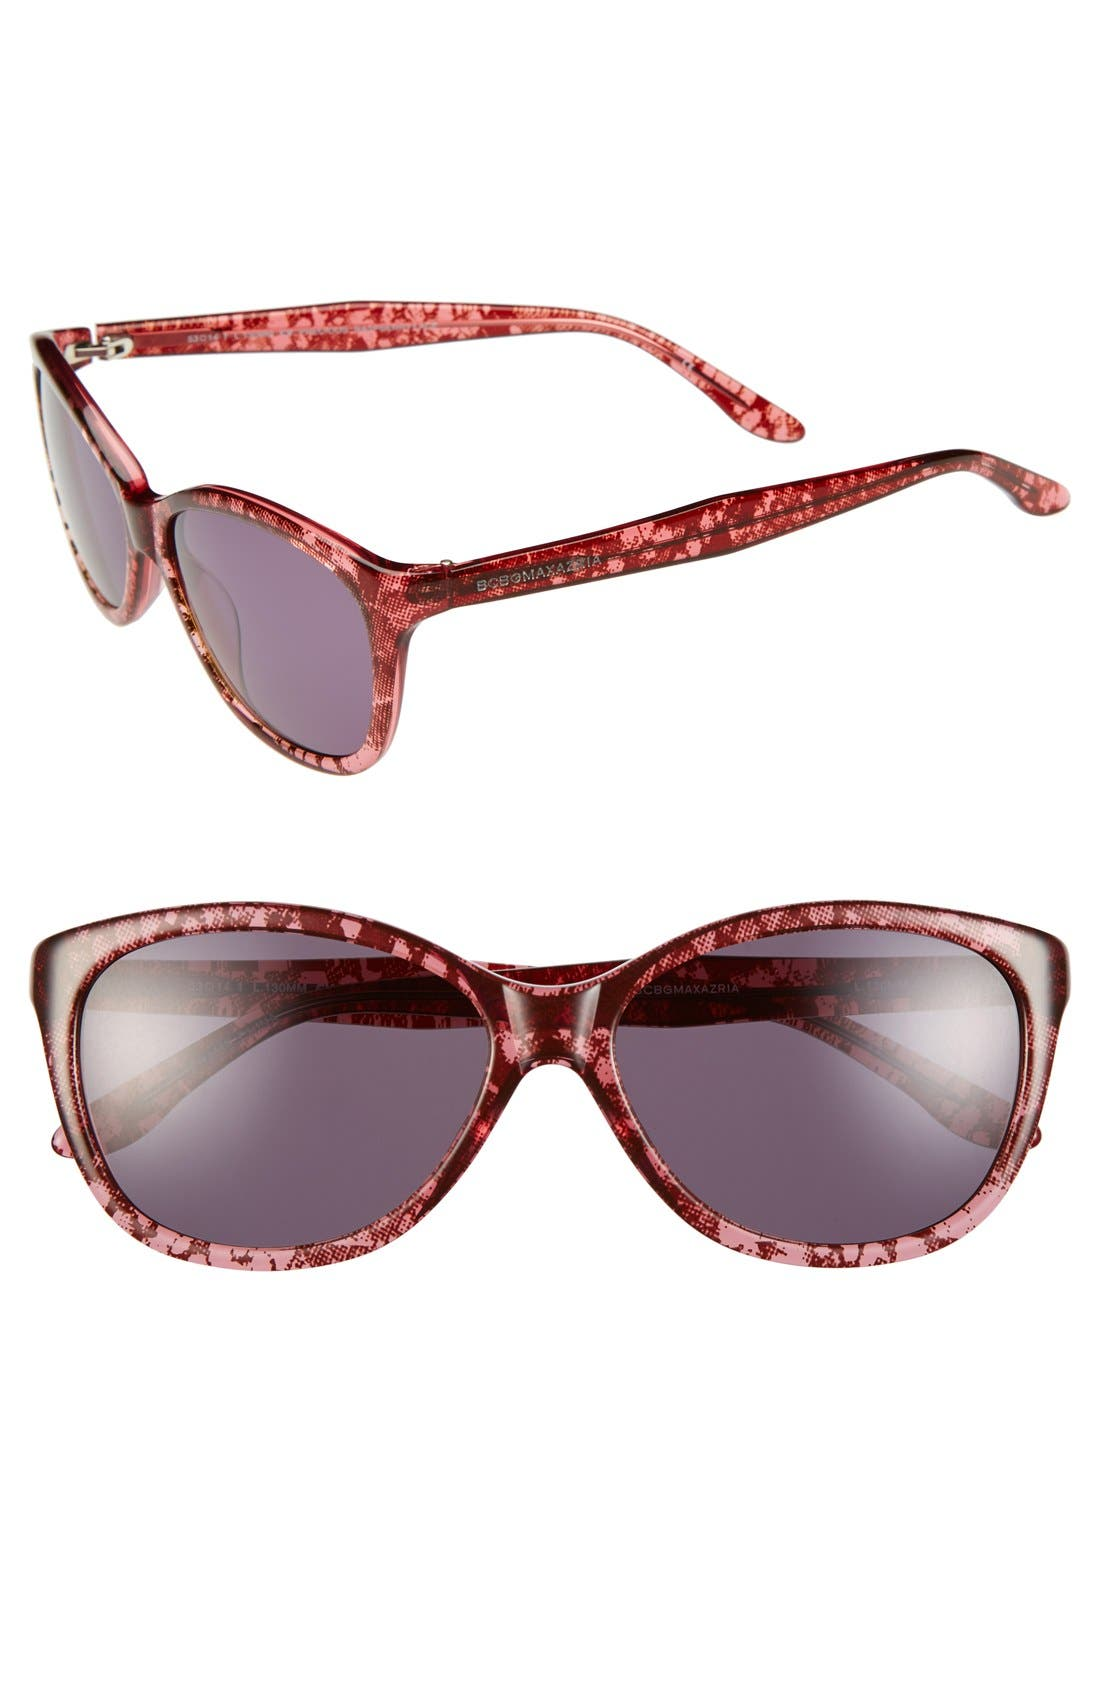 Alternate Image 1 Selected - BCBGMAXAZRIA 'Precious' 53mm Sunglasses